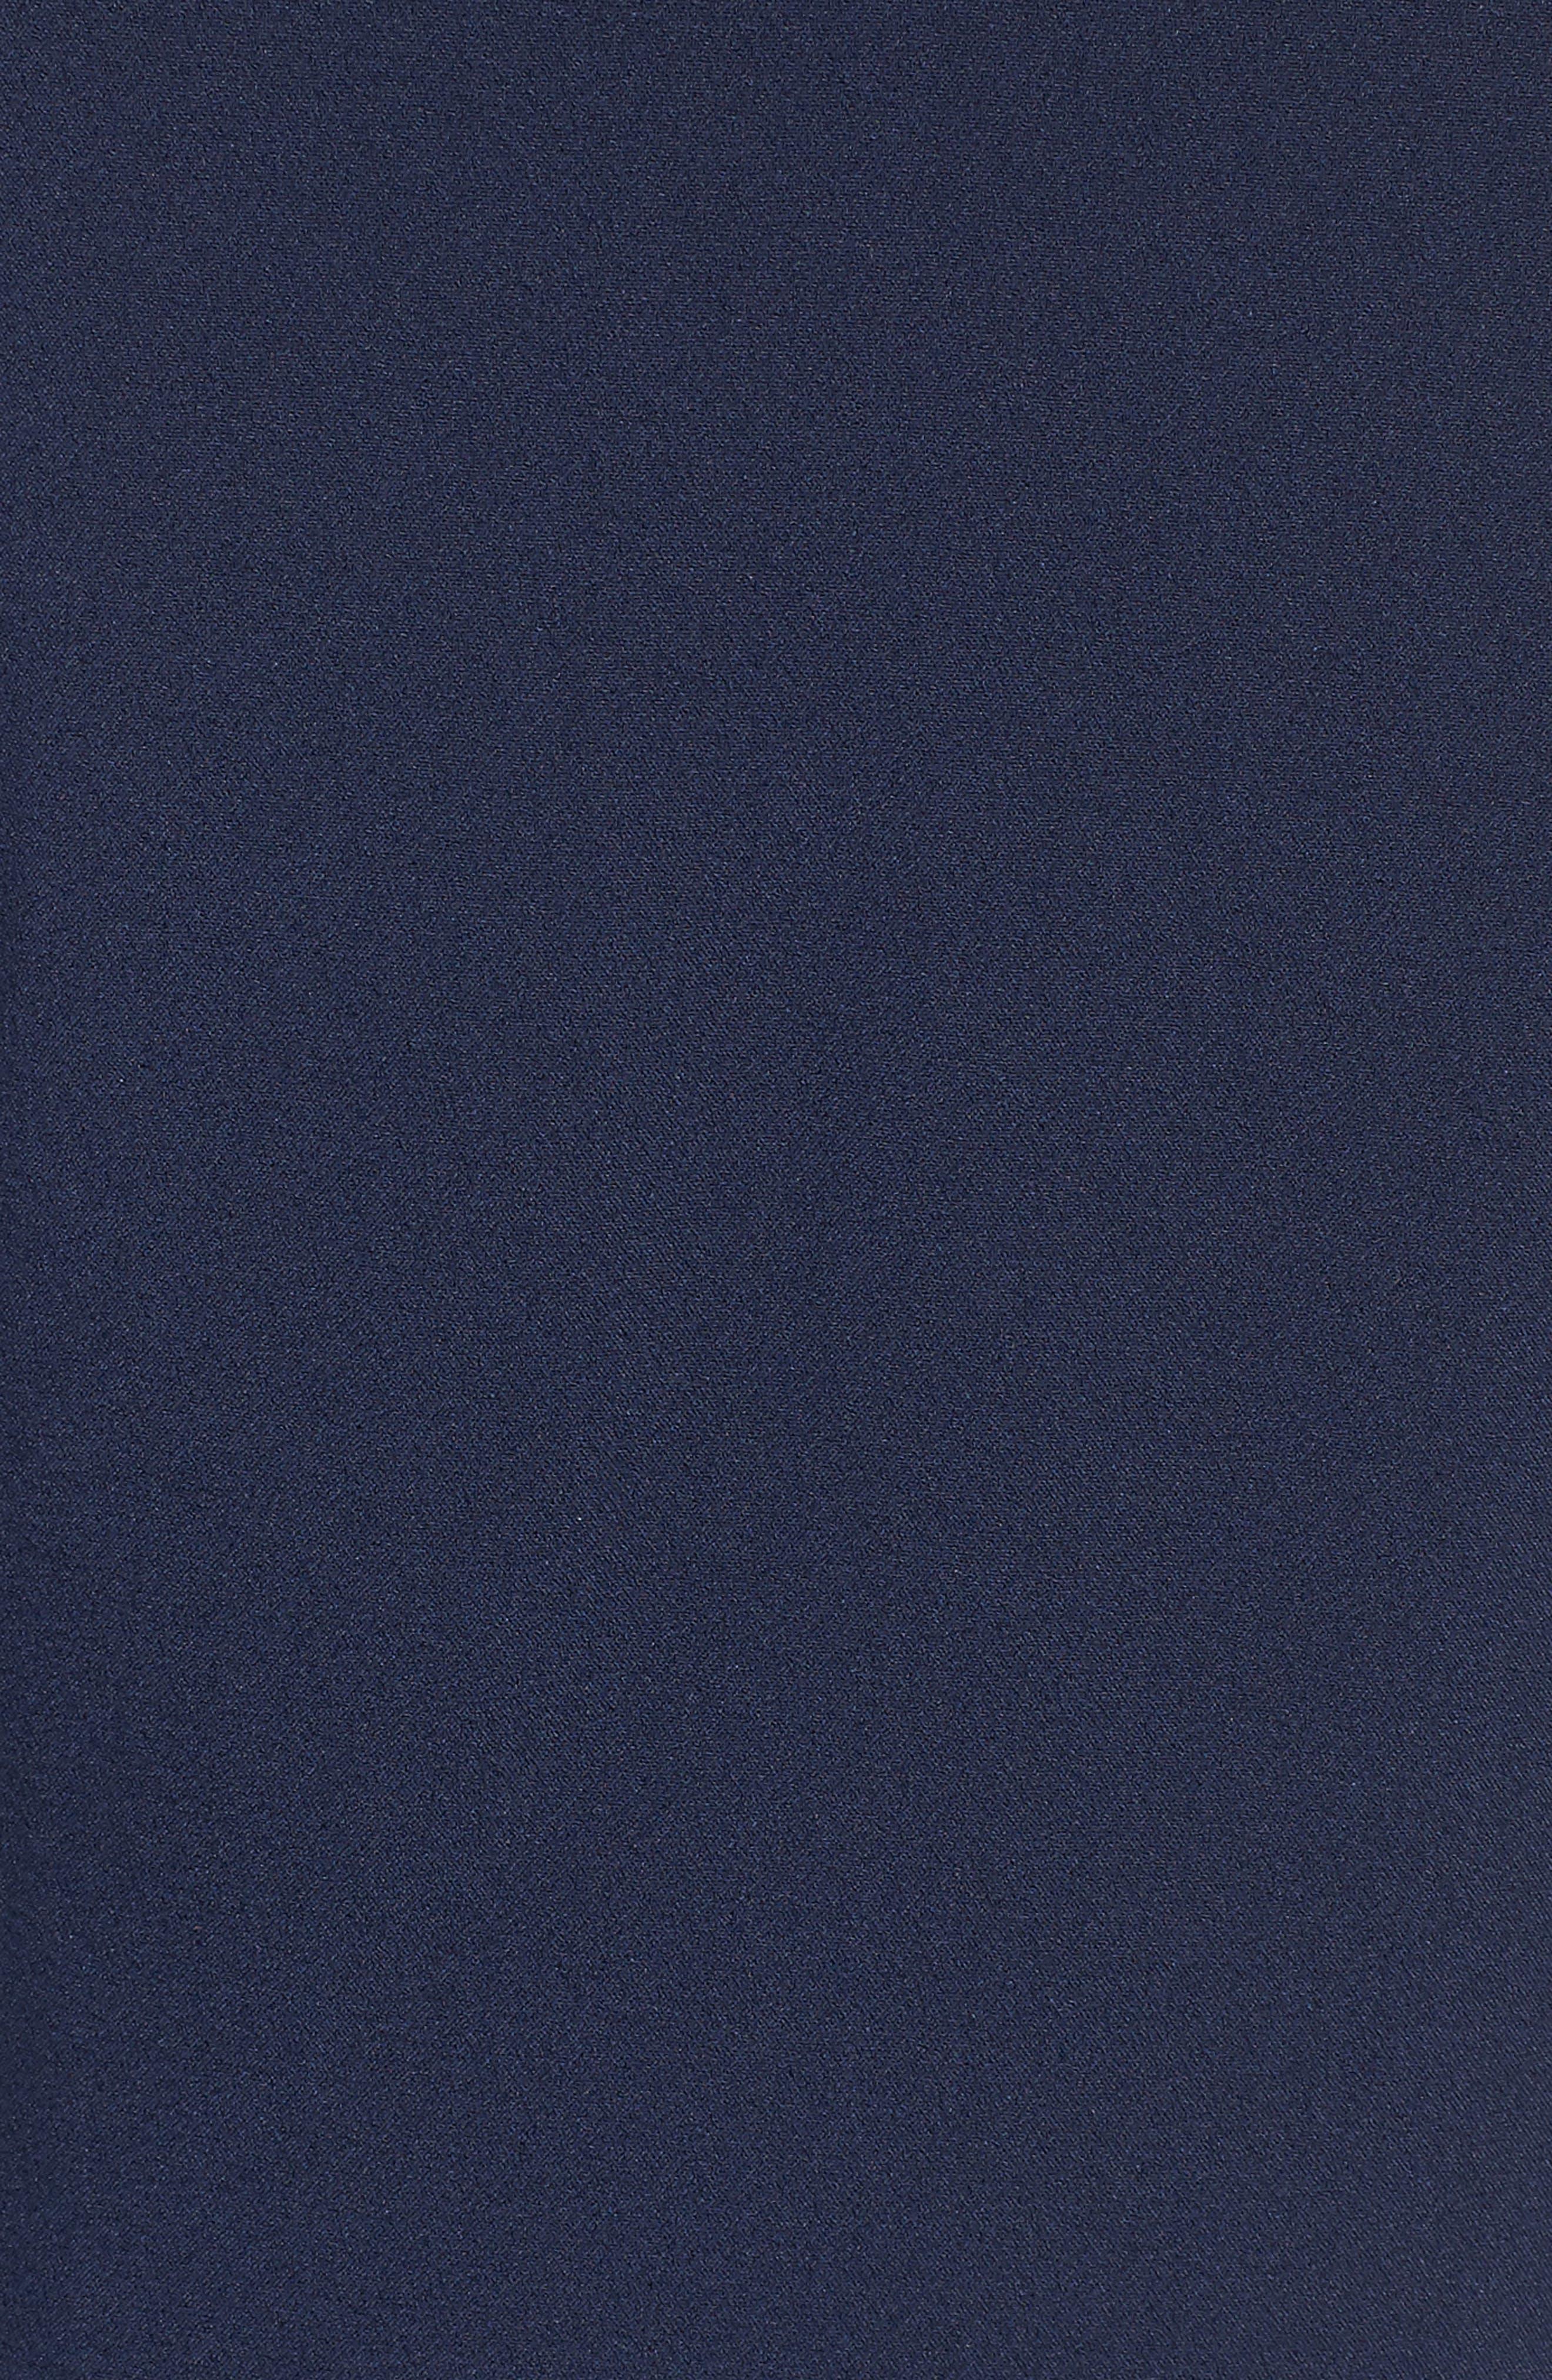 Brigitte Midi Dress,                             Alternate thumbnail 6, color,                             NAVY